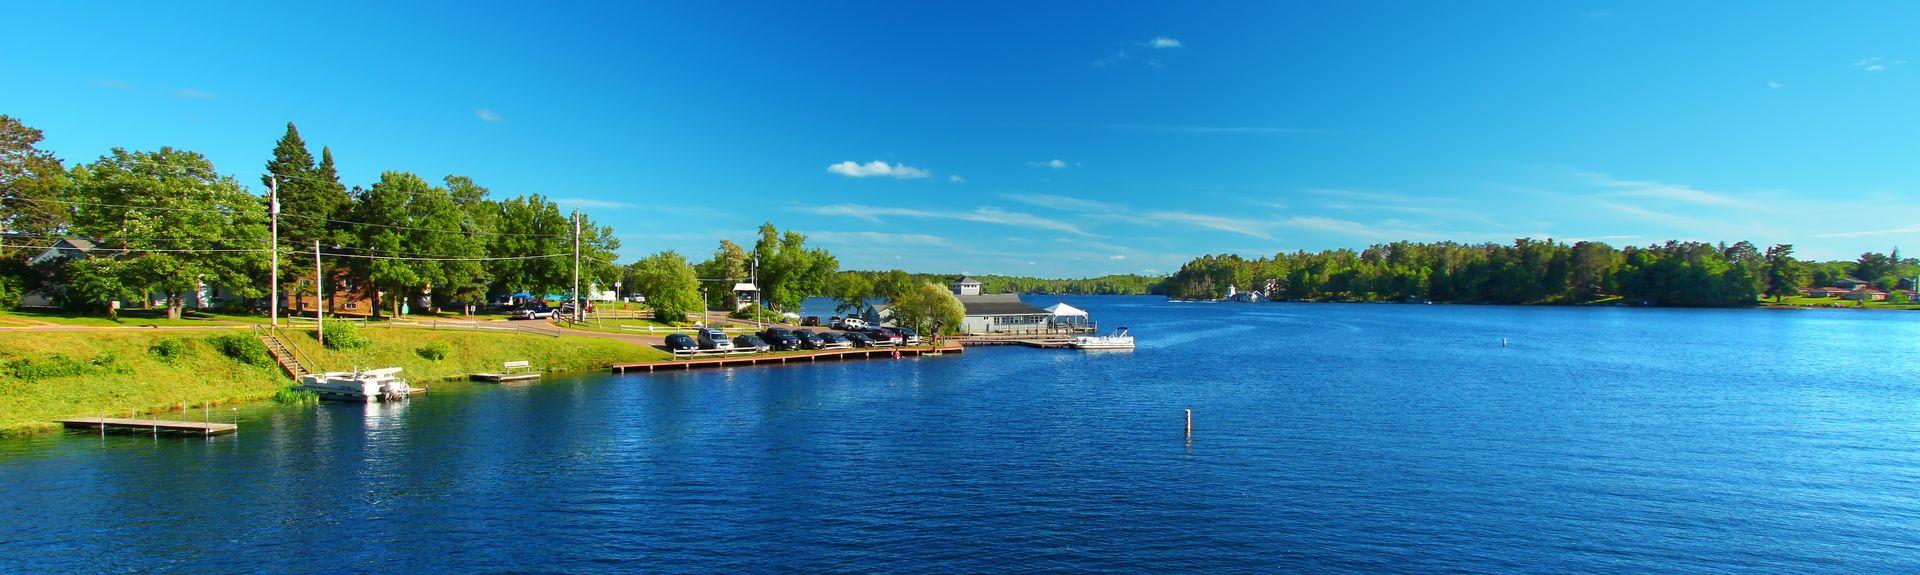 Minocqua, Wisconsin, United States of America